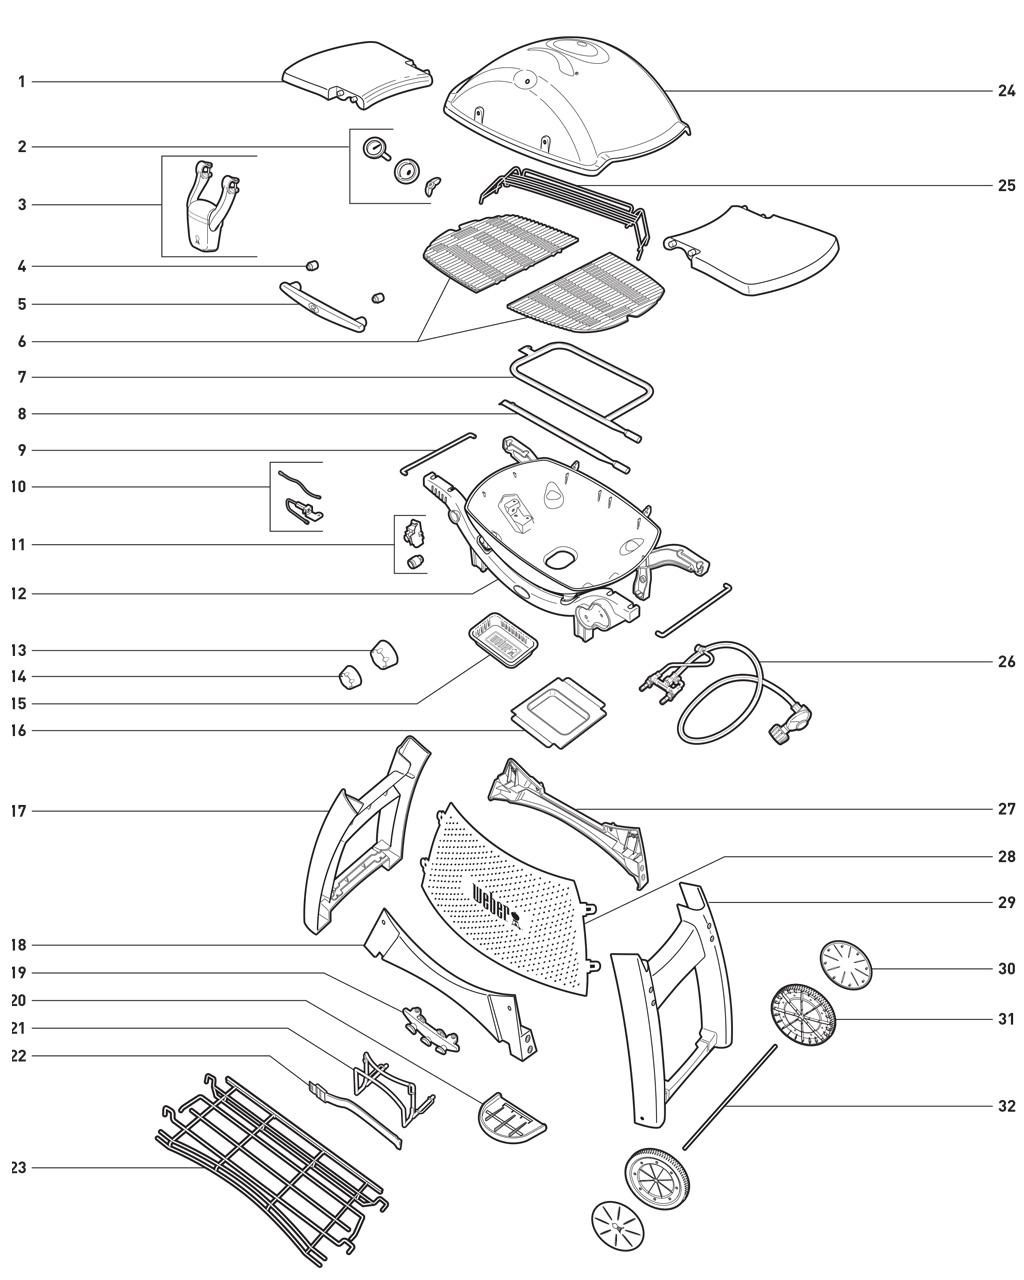 Schematic Image 57060001